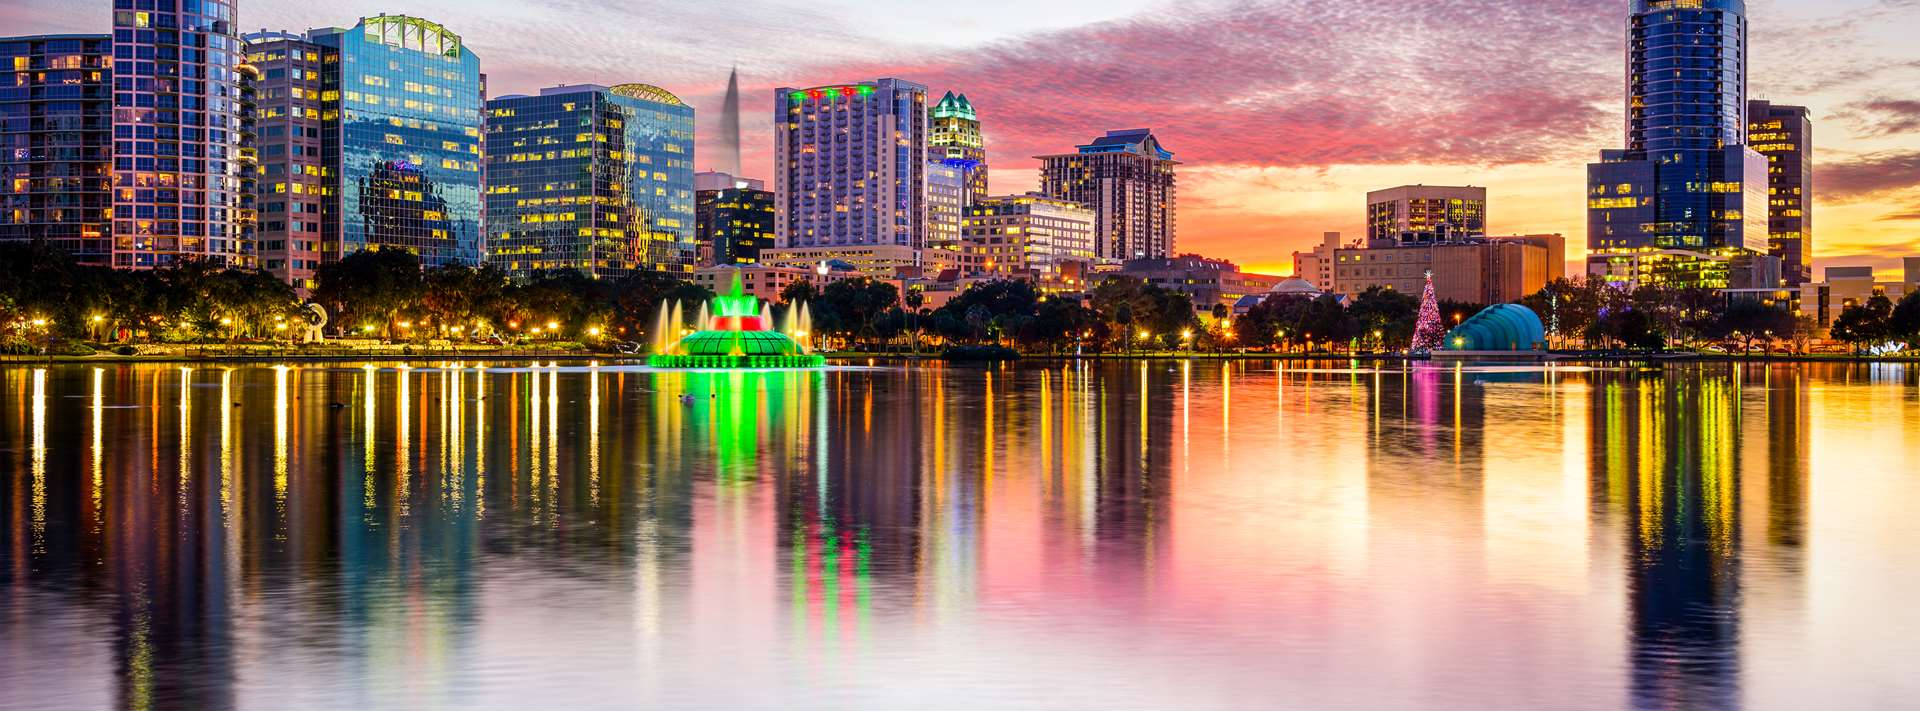 Cheap Flights To Orlando From 163 295 Netflights